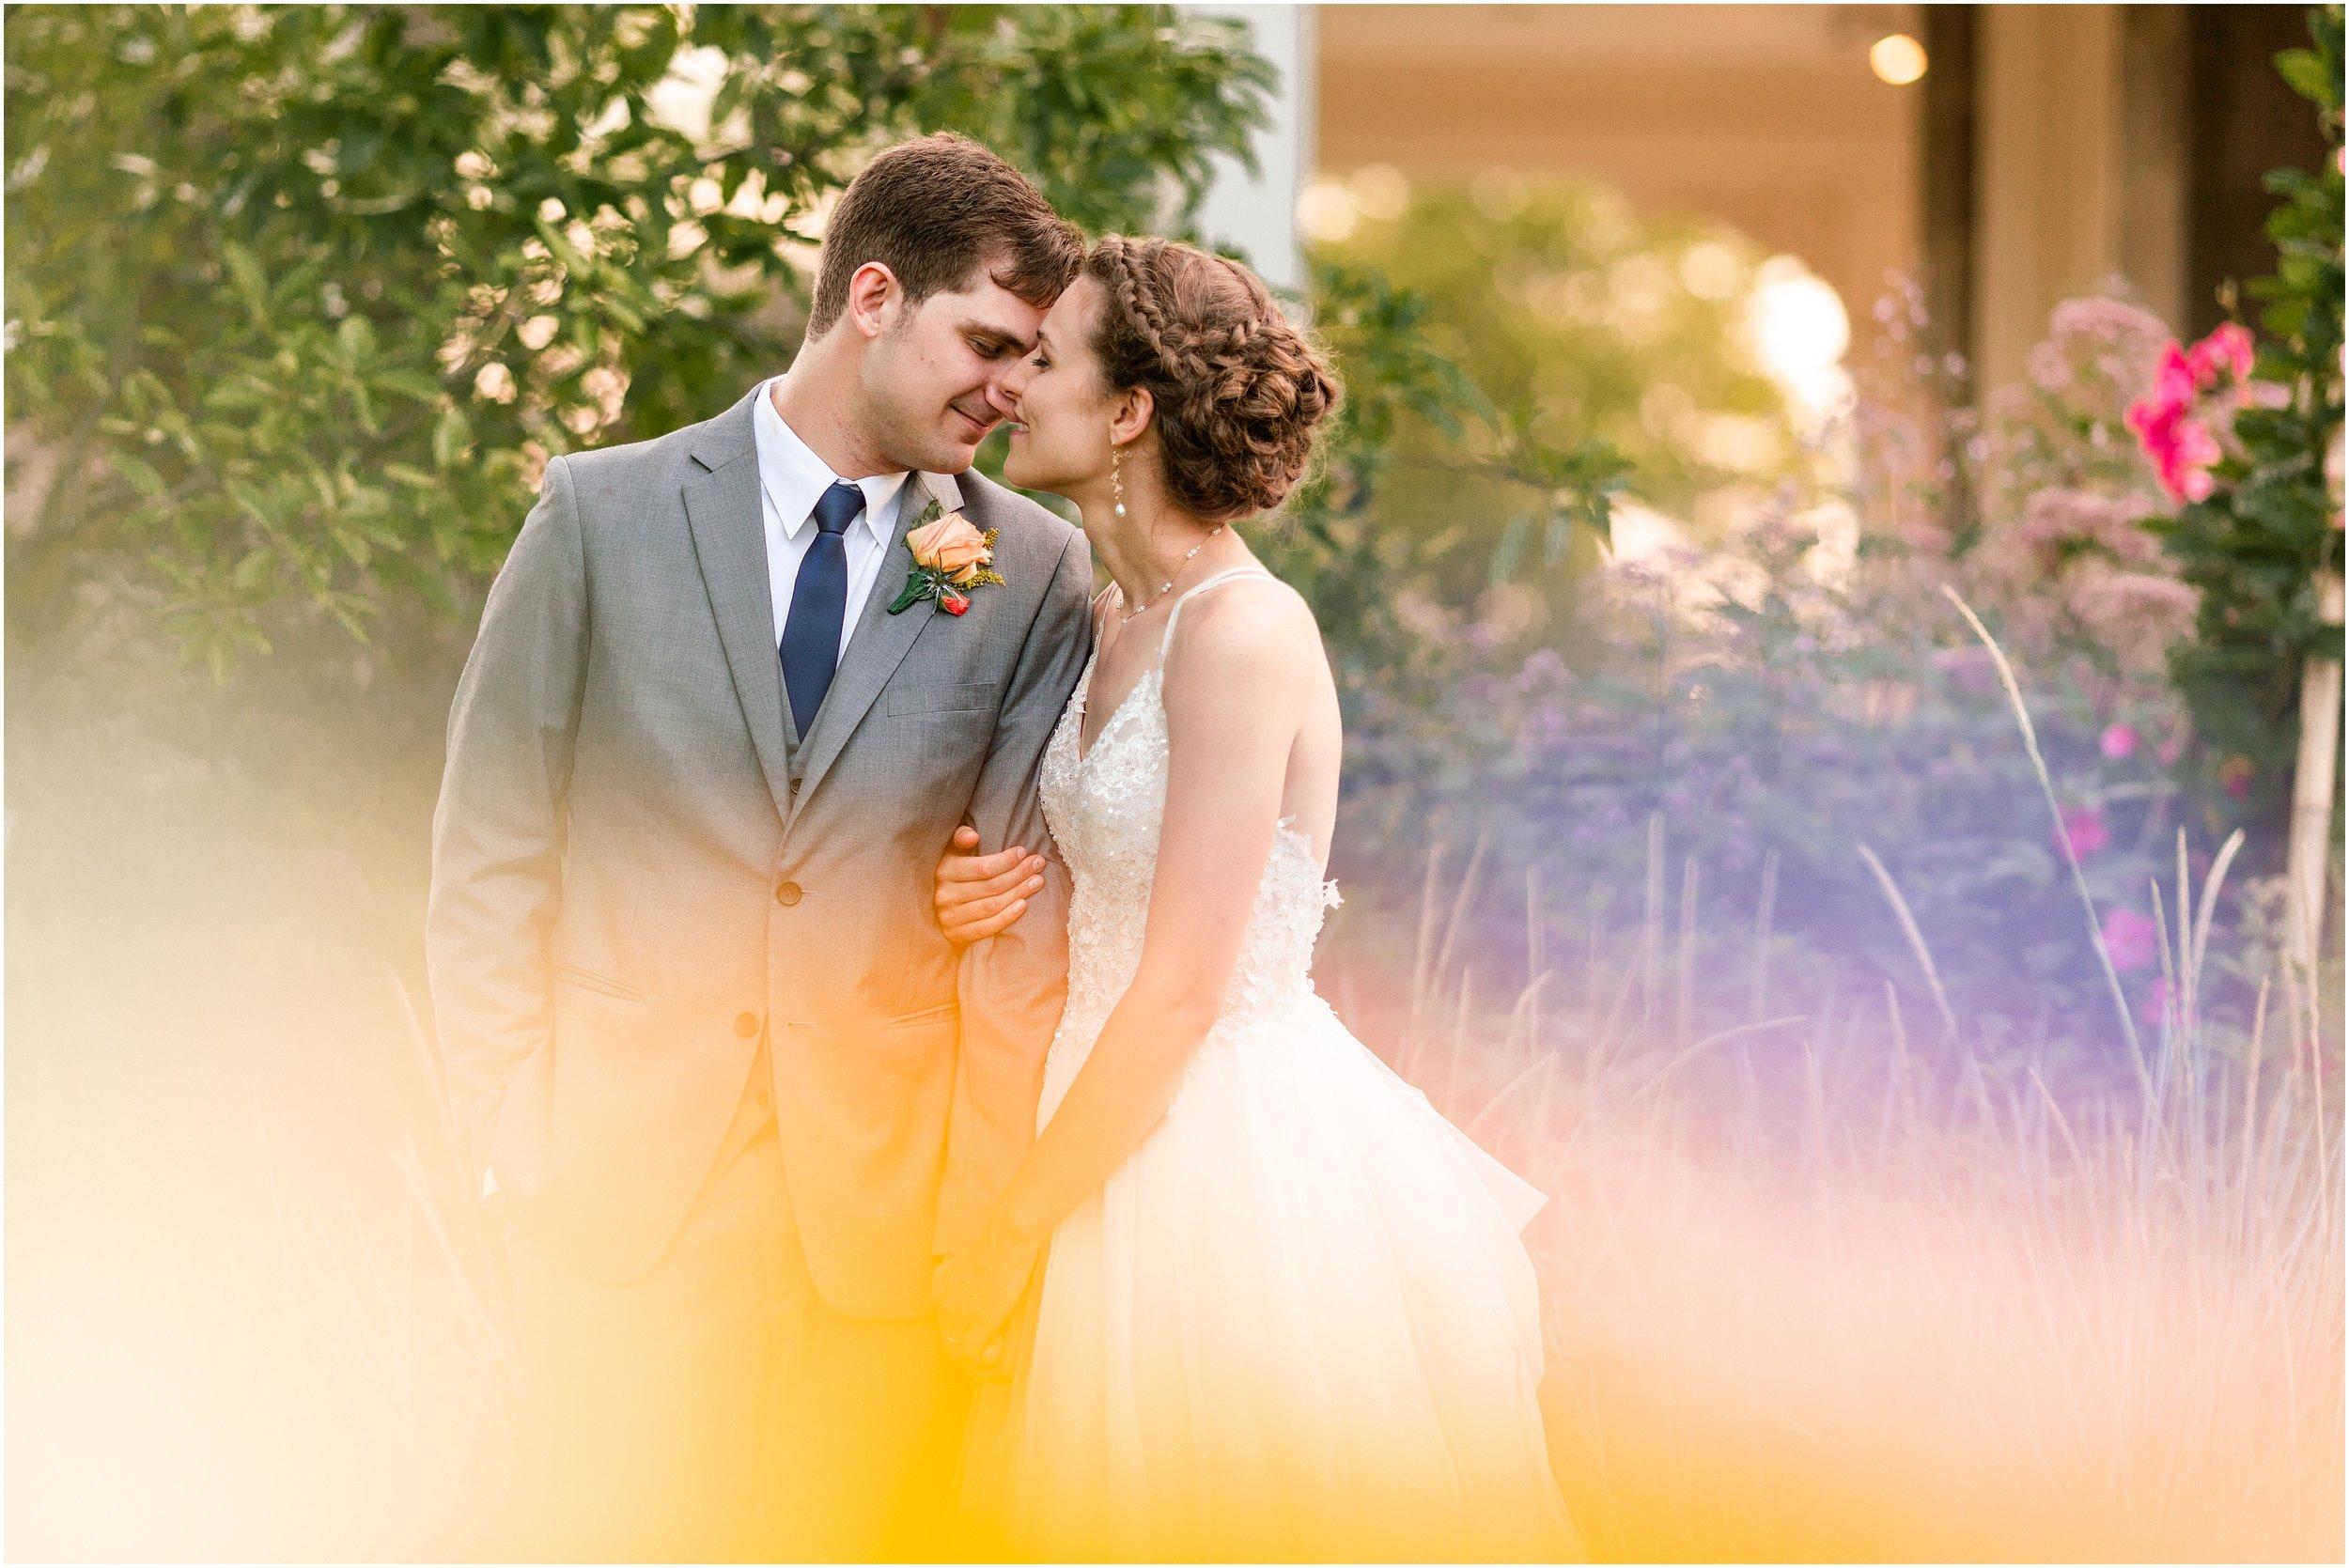 hannah leigh photography Cylburn Arboretum Wedding Baltimore, MD_3463.jpg